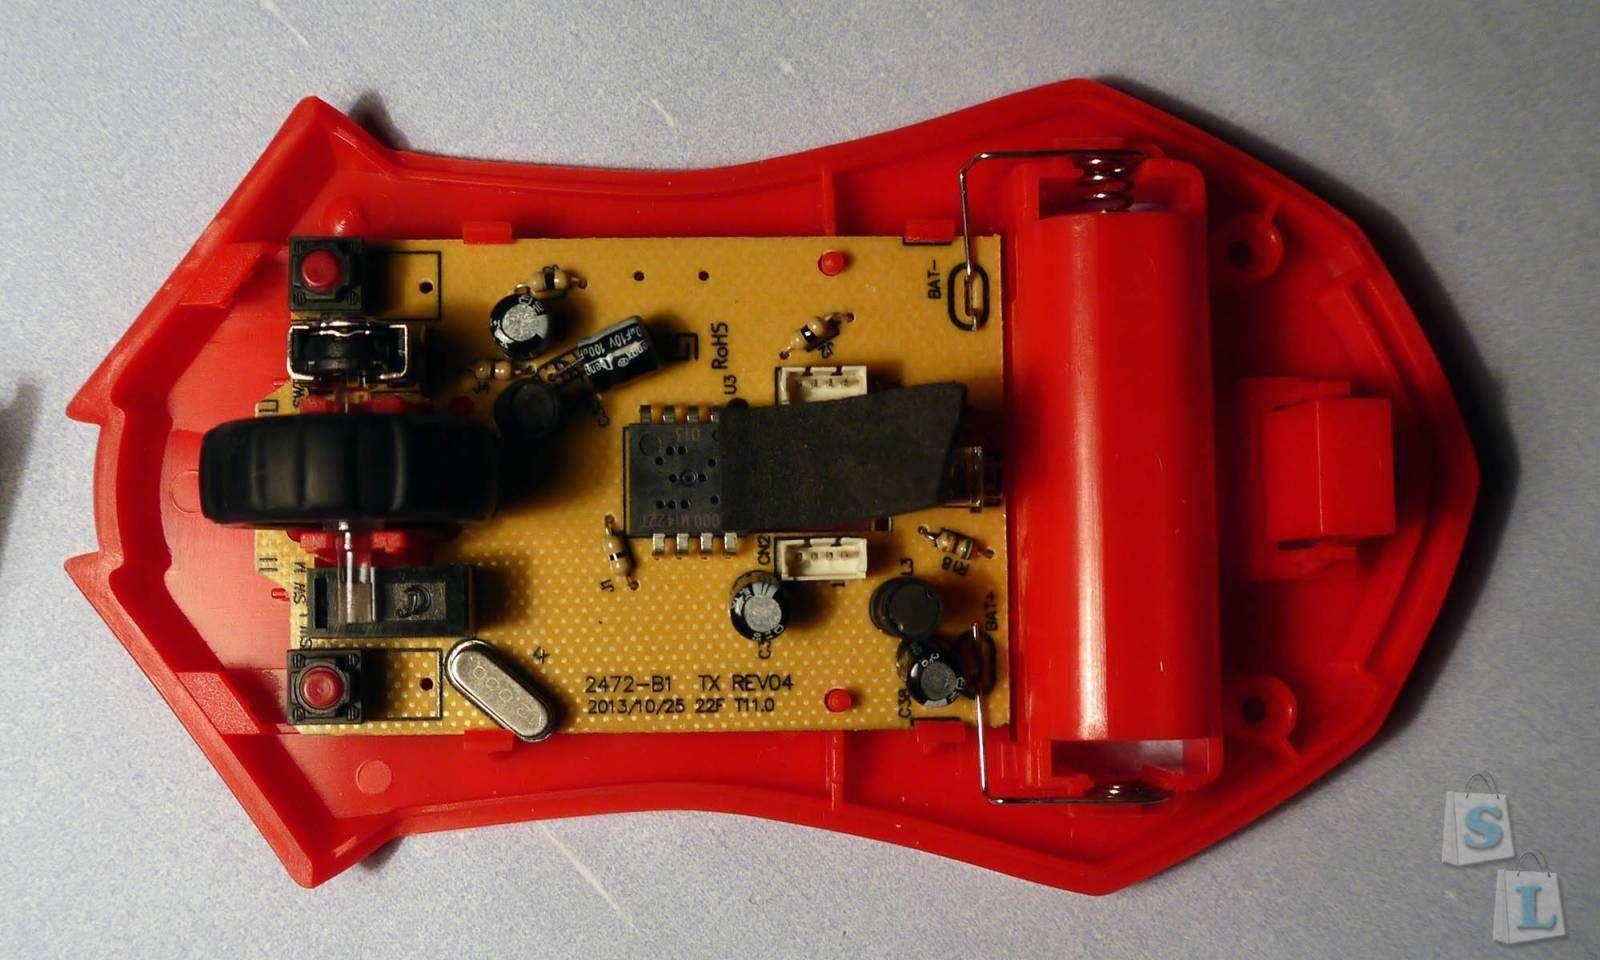 Aliexpress: Беспроводная мышь Easterntimes Tech X-08 2000DPI